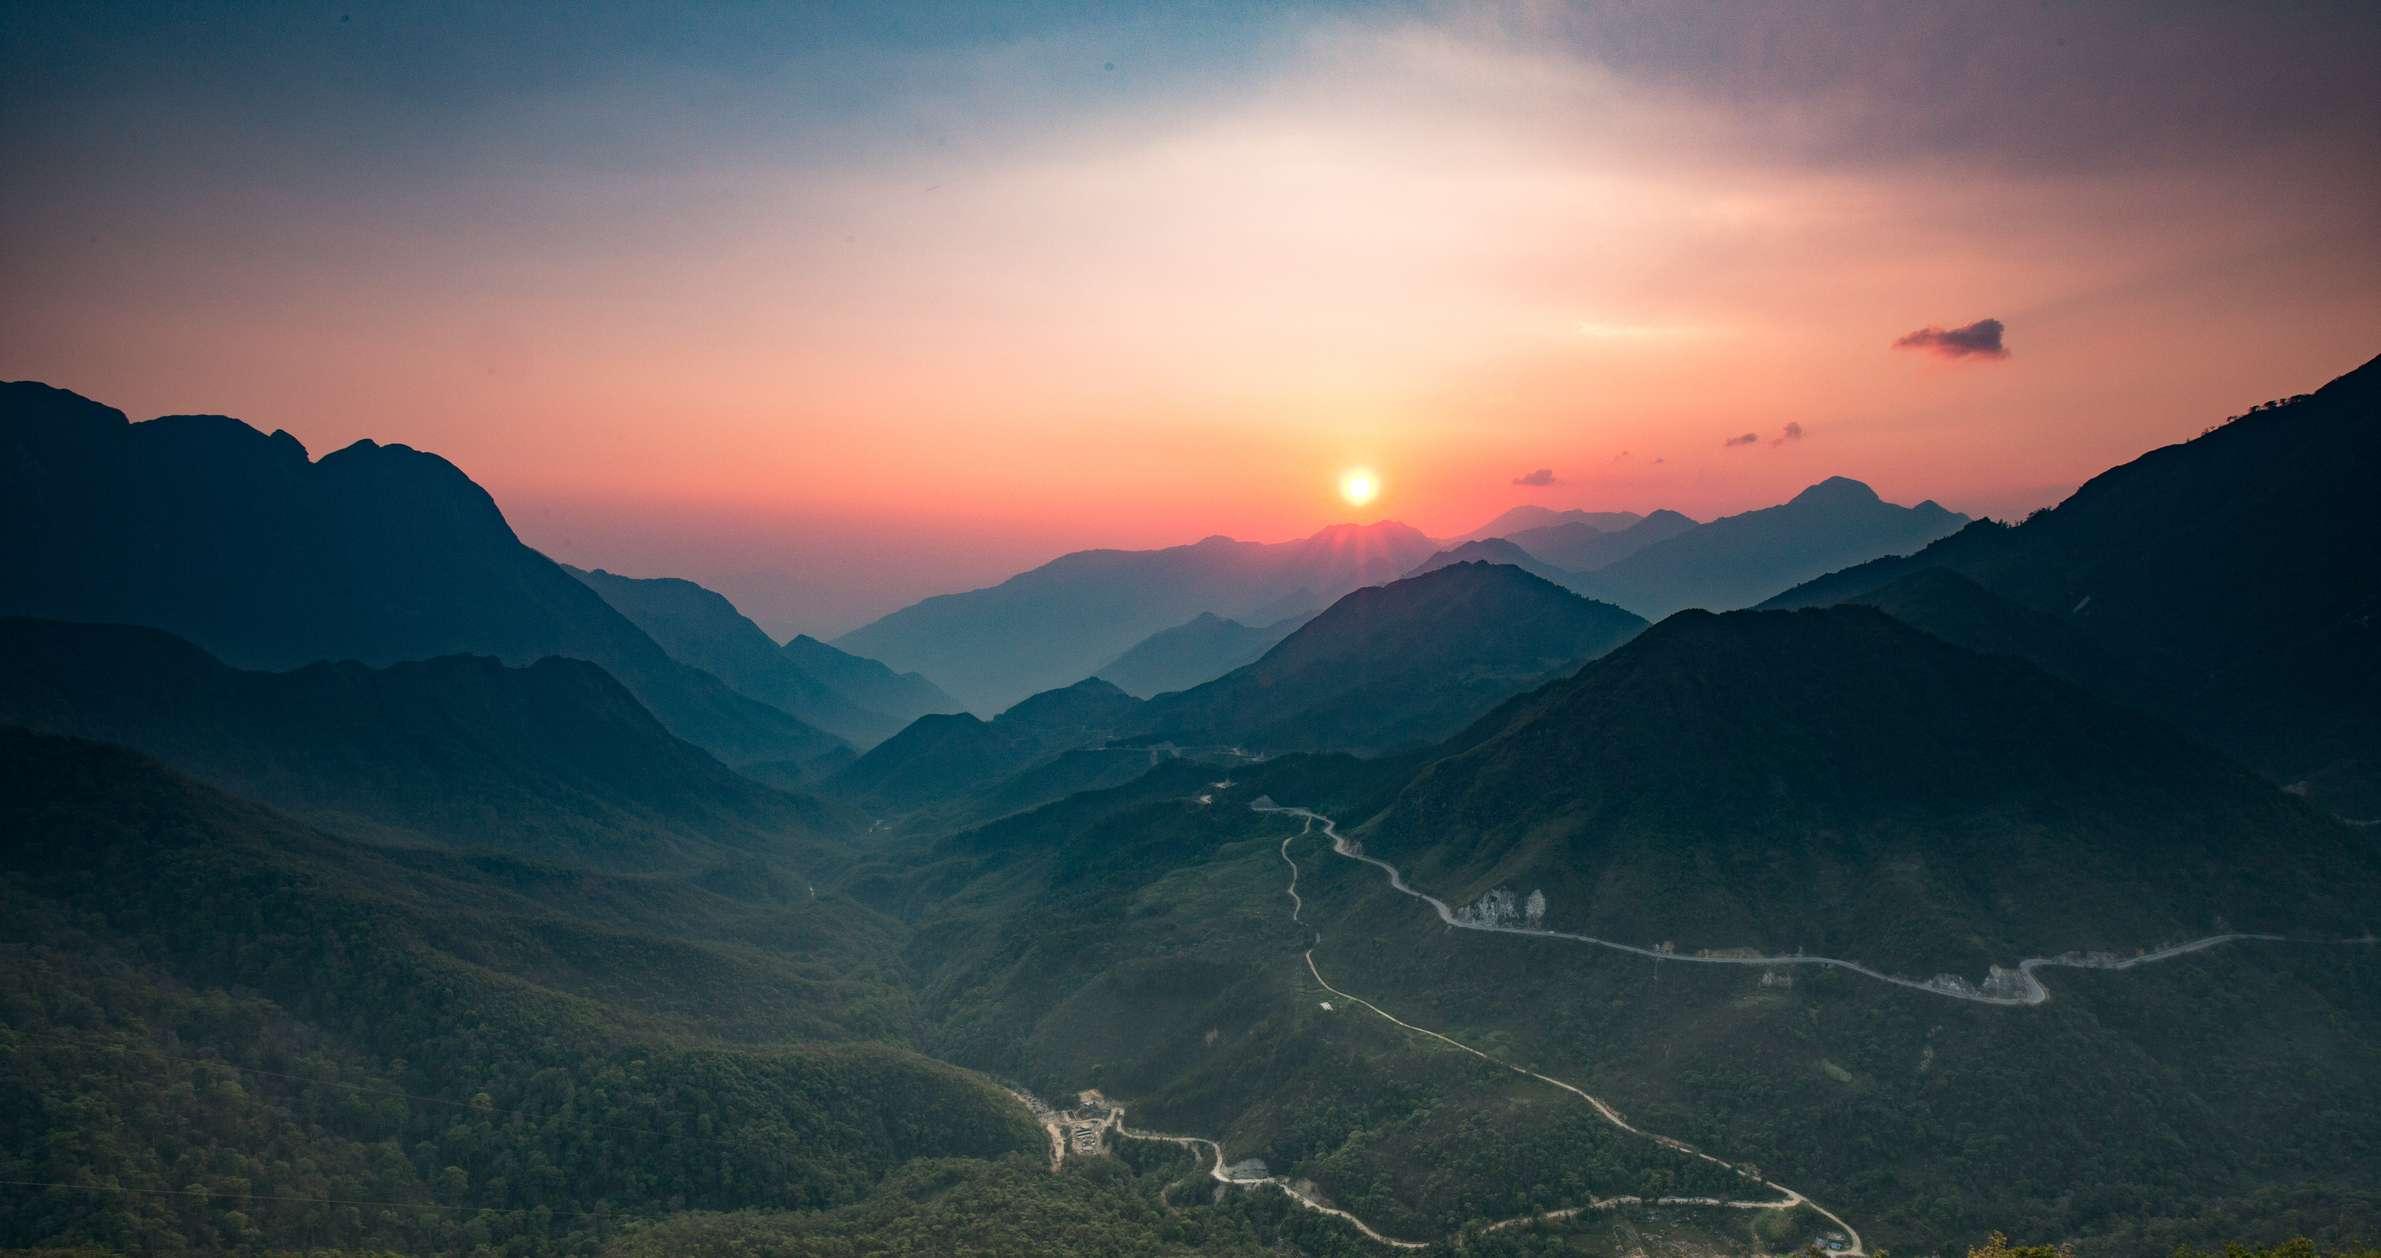 Sunset in O Quy Ho Pass, Sapa, Vietnam